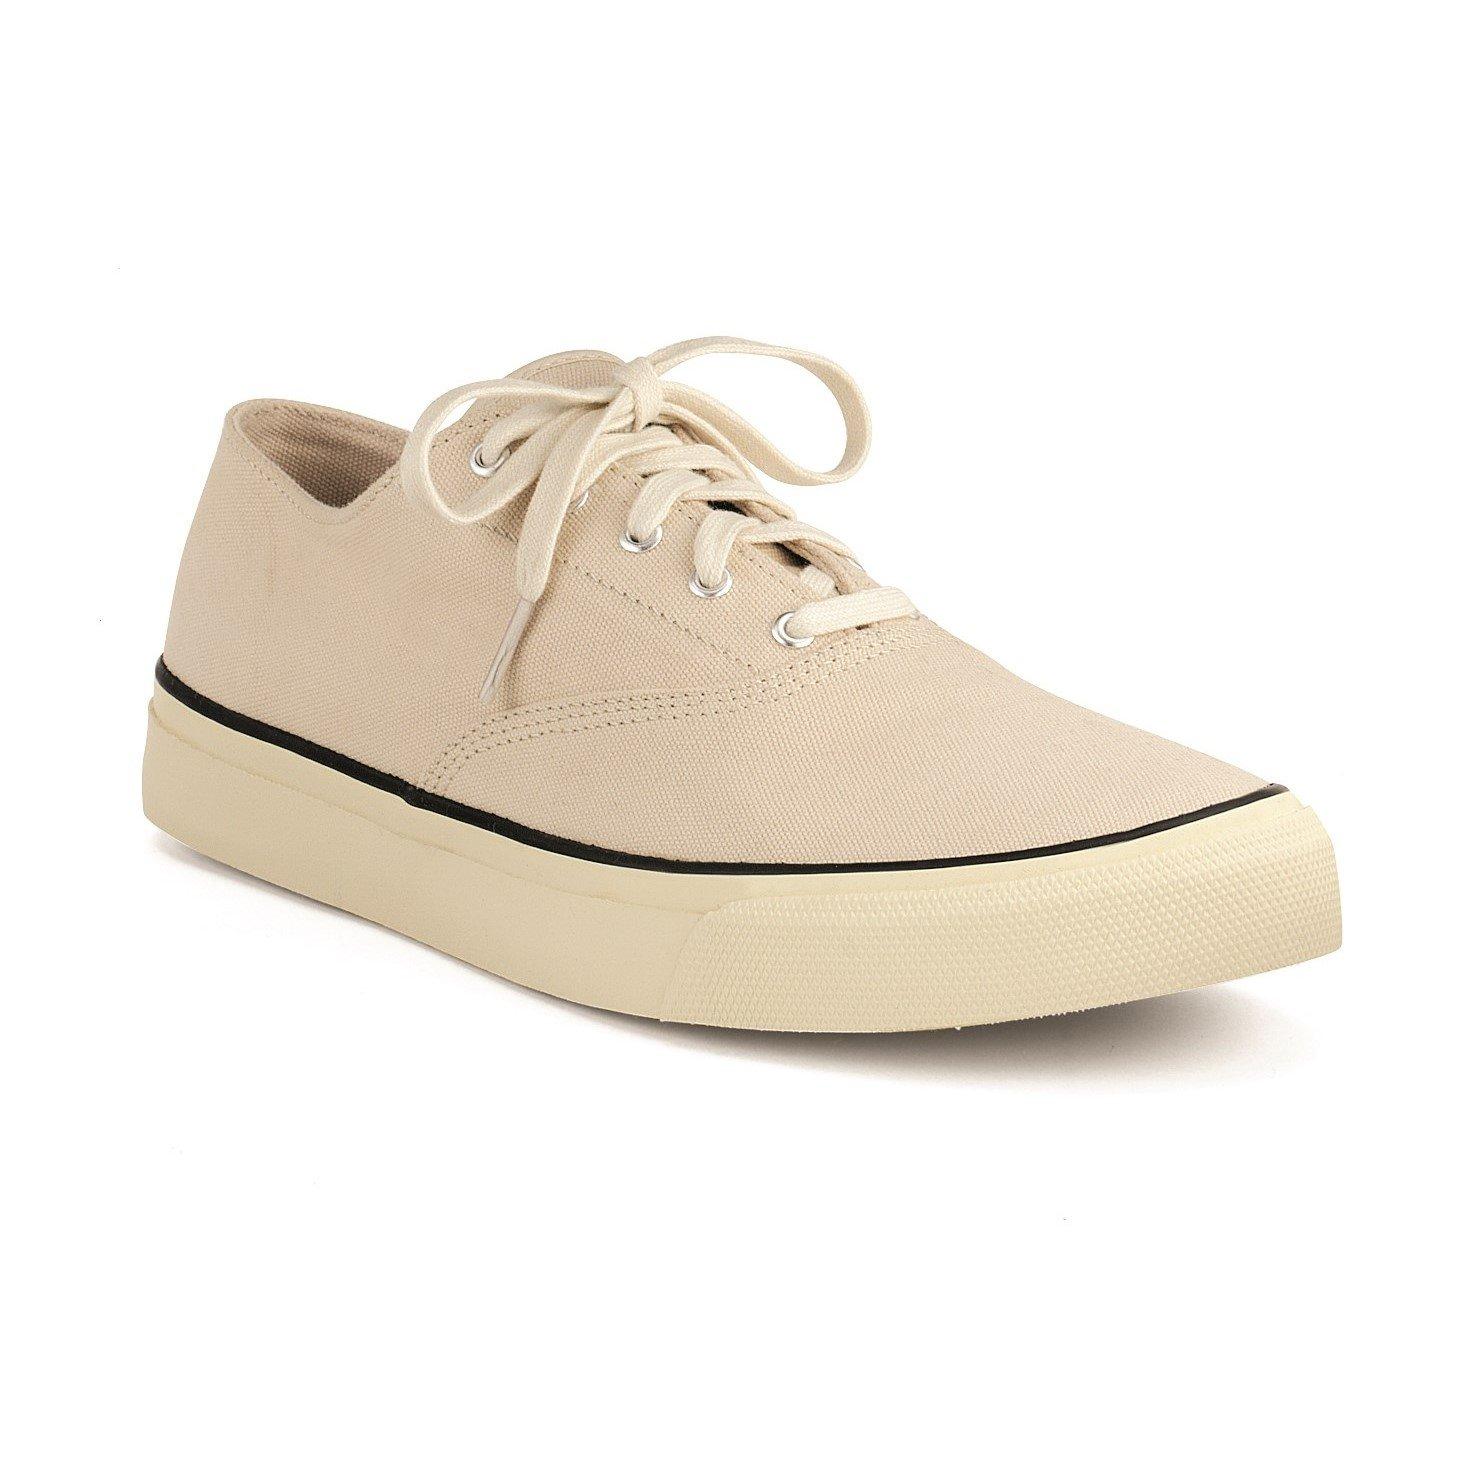 Sperry Men's Cloud CVO Boat Shoe Various Colours 33537 - White 10